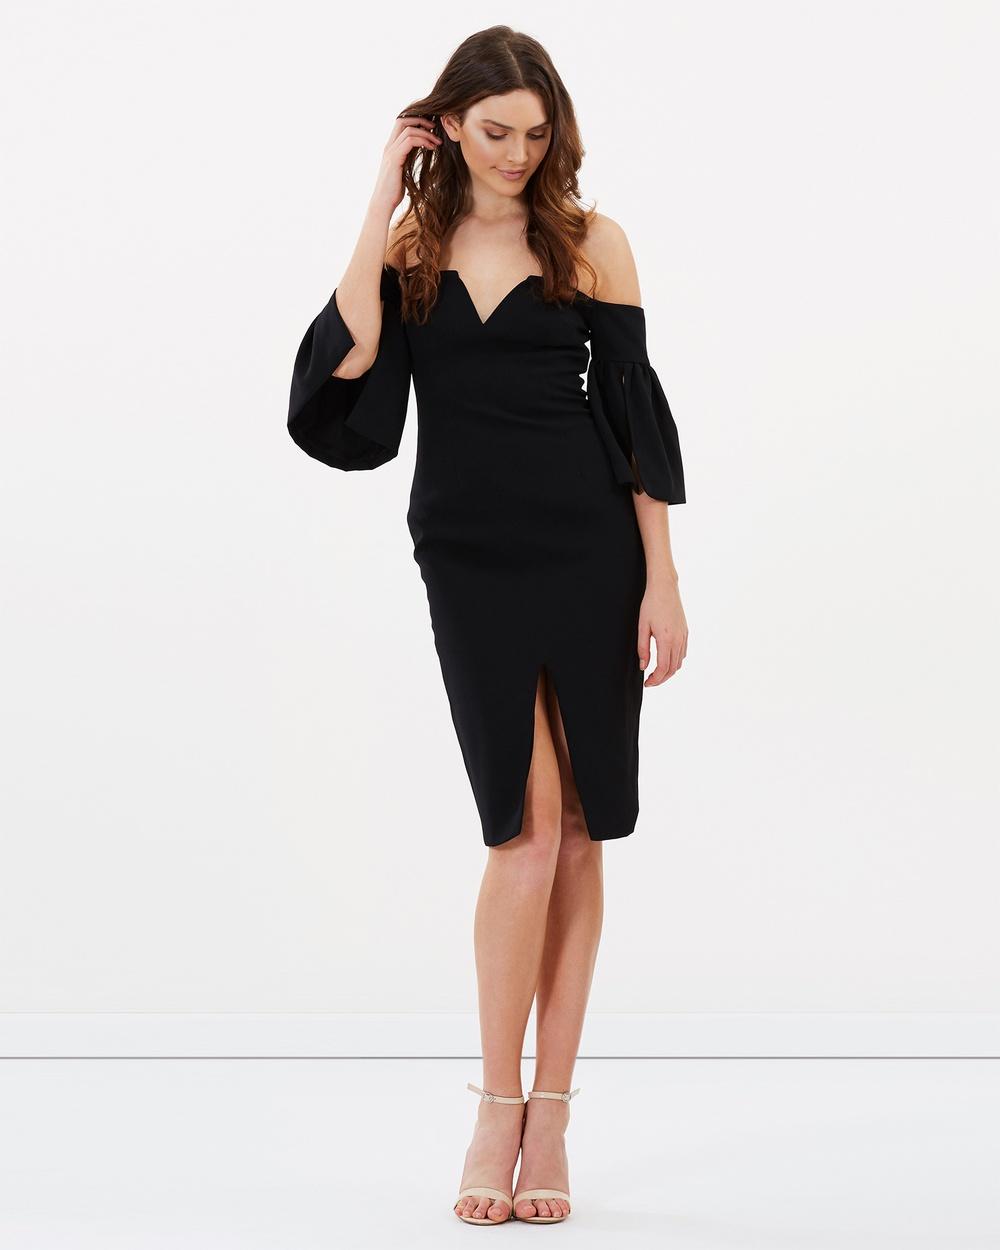 SANTINA-NICOLE Aurora Sheer V Dress Dresses Black Aurora Sheer V Dress